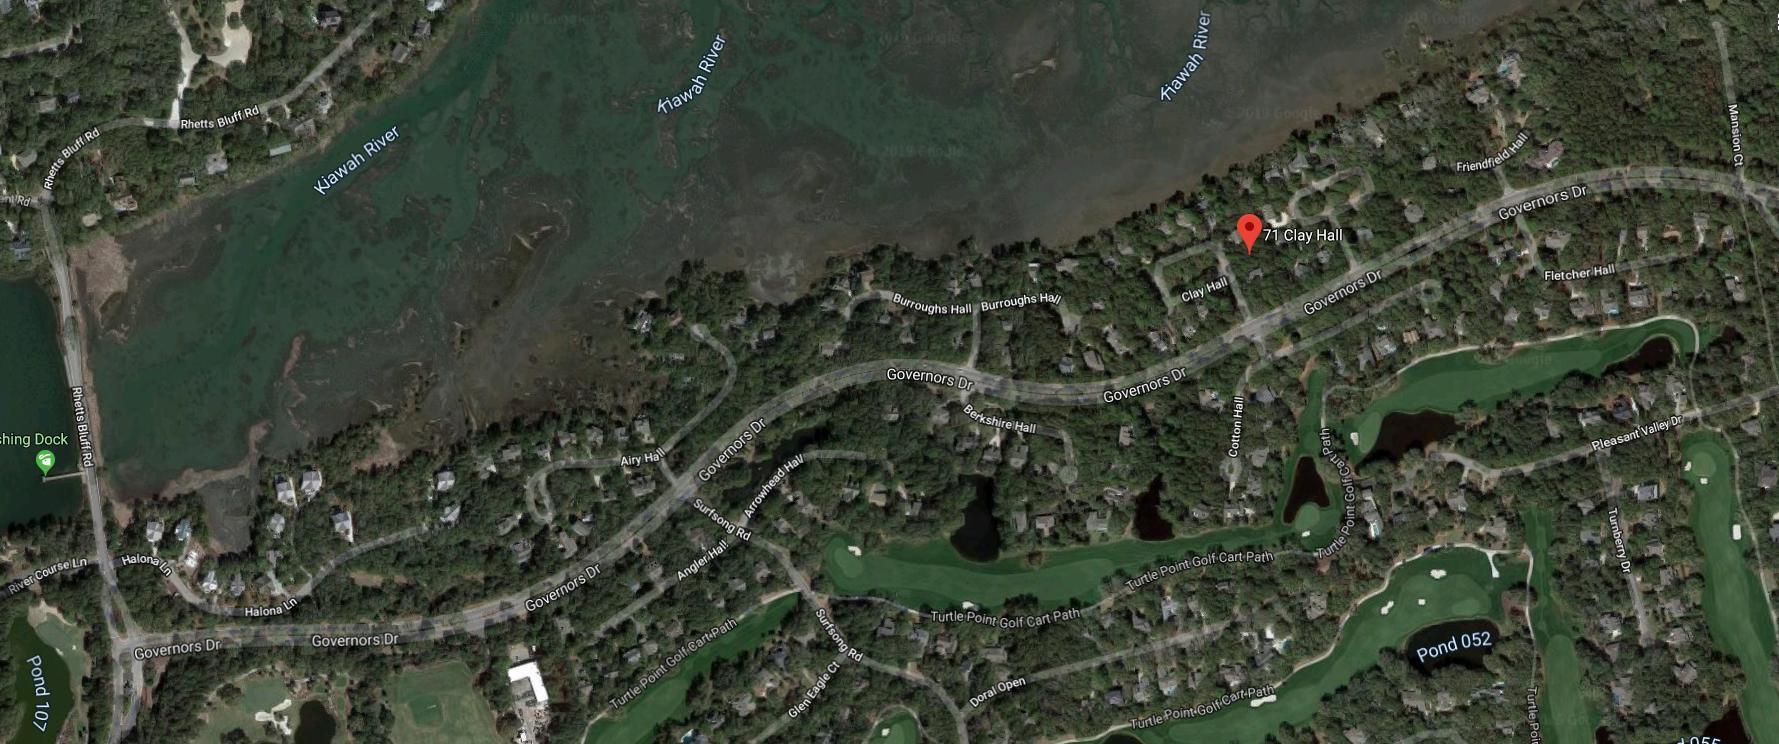 71 Clay Hall Kiawah Island, SC 29455